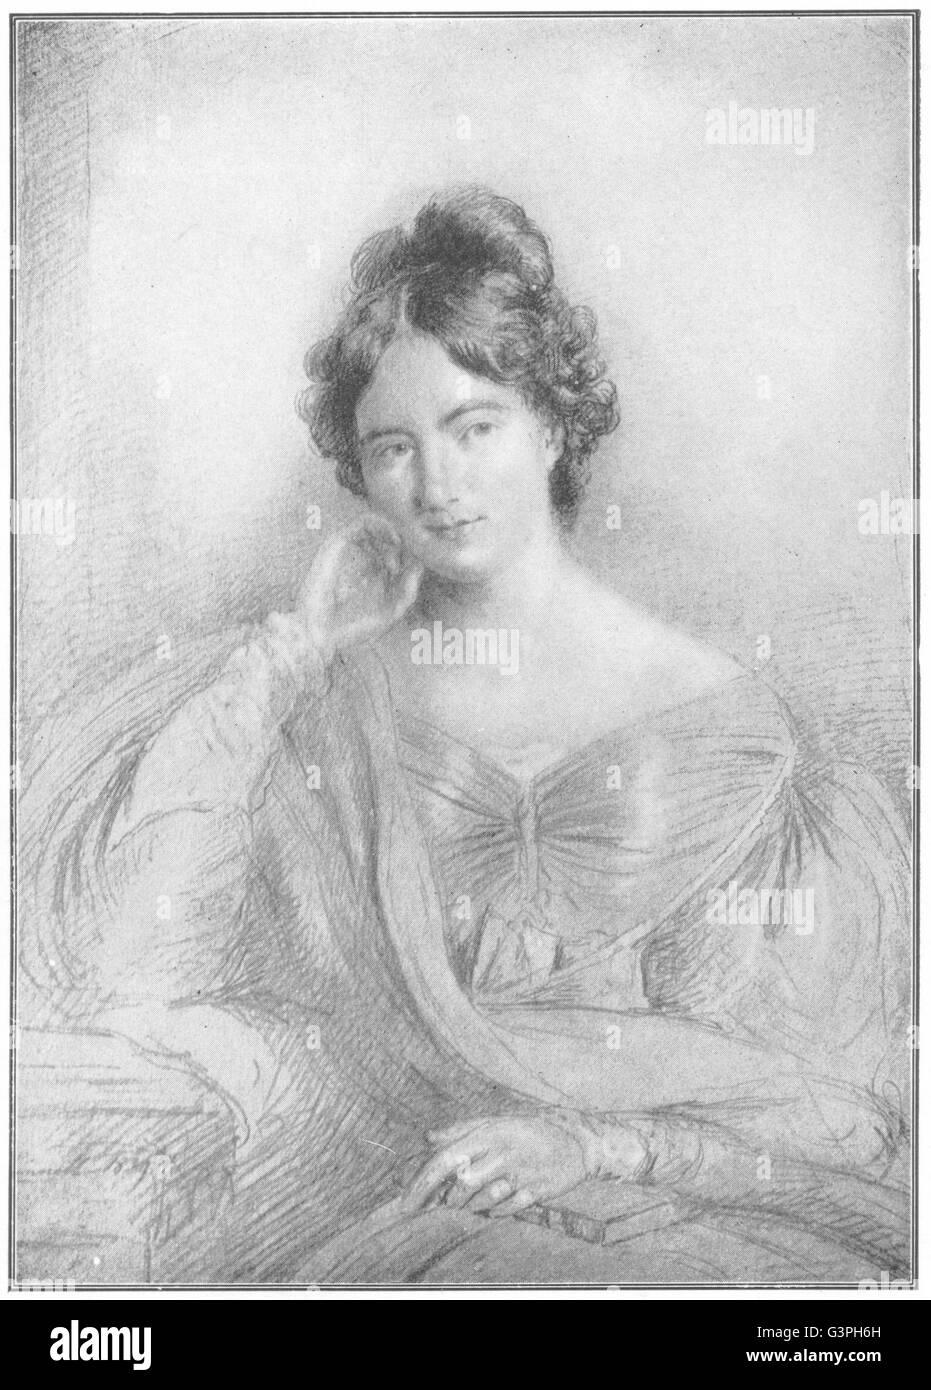 Autores: Jane Austen, grabado antiguo 1907 Imagen De Stock